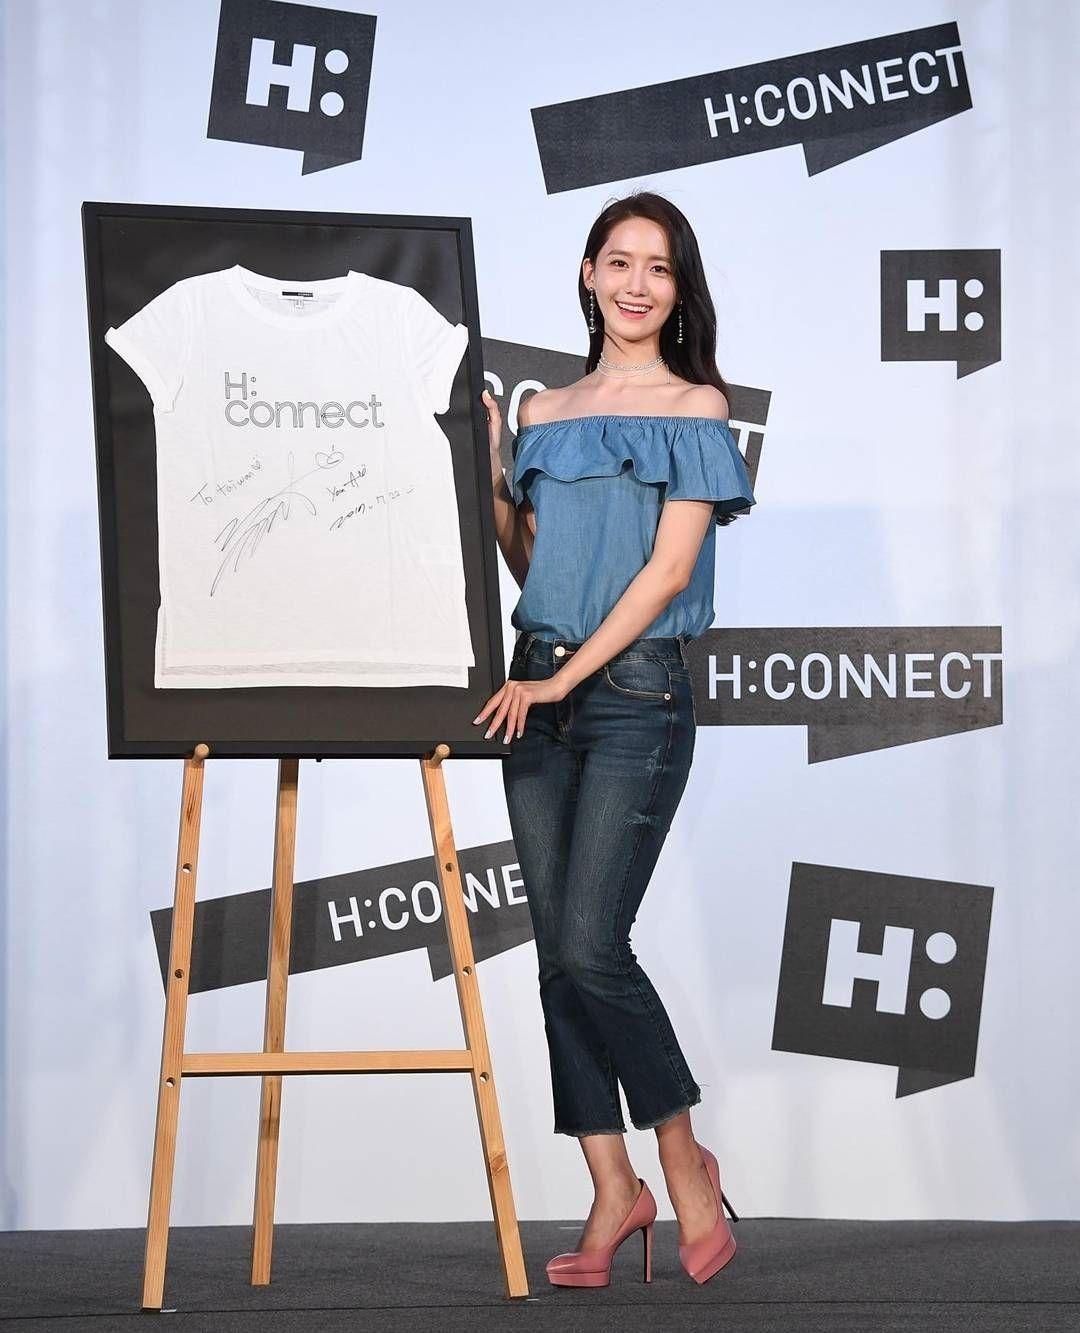 regram @_limyoonafanpage 170722 Yoona  At H:Connect event in Taiwan {#yoona #imyoona #yoonalim #limyoona #sonyuhshidae #임윤아#윤아#林允儿#ユナ#girlsgeneration#소녀시대 @yoona__lim }